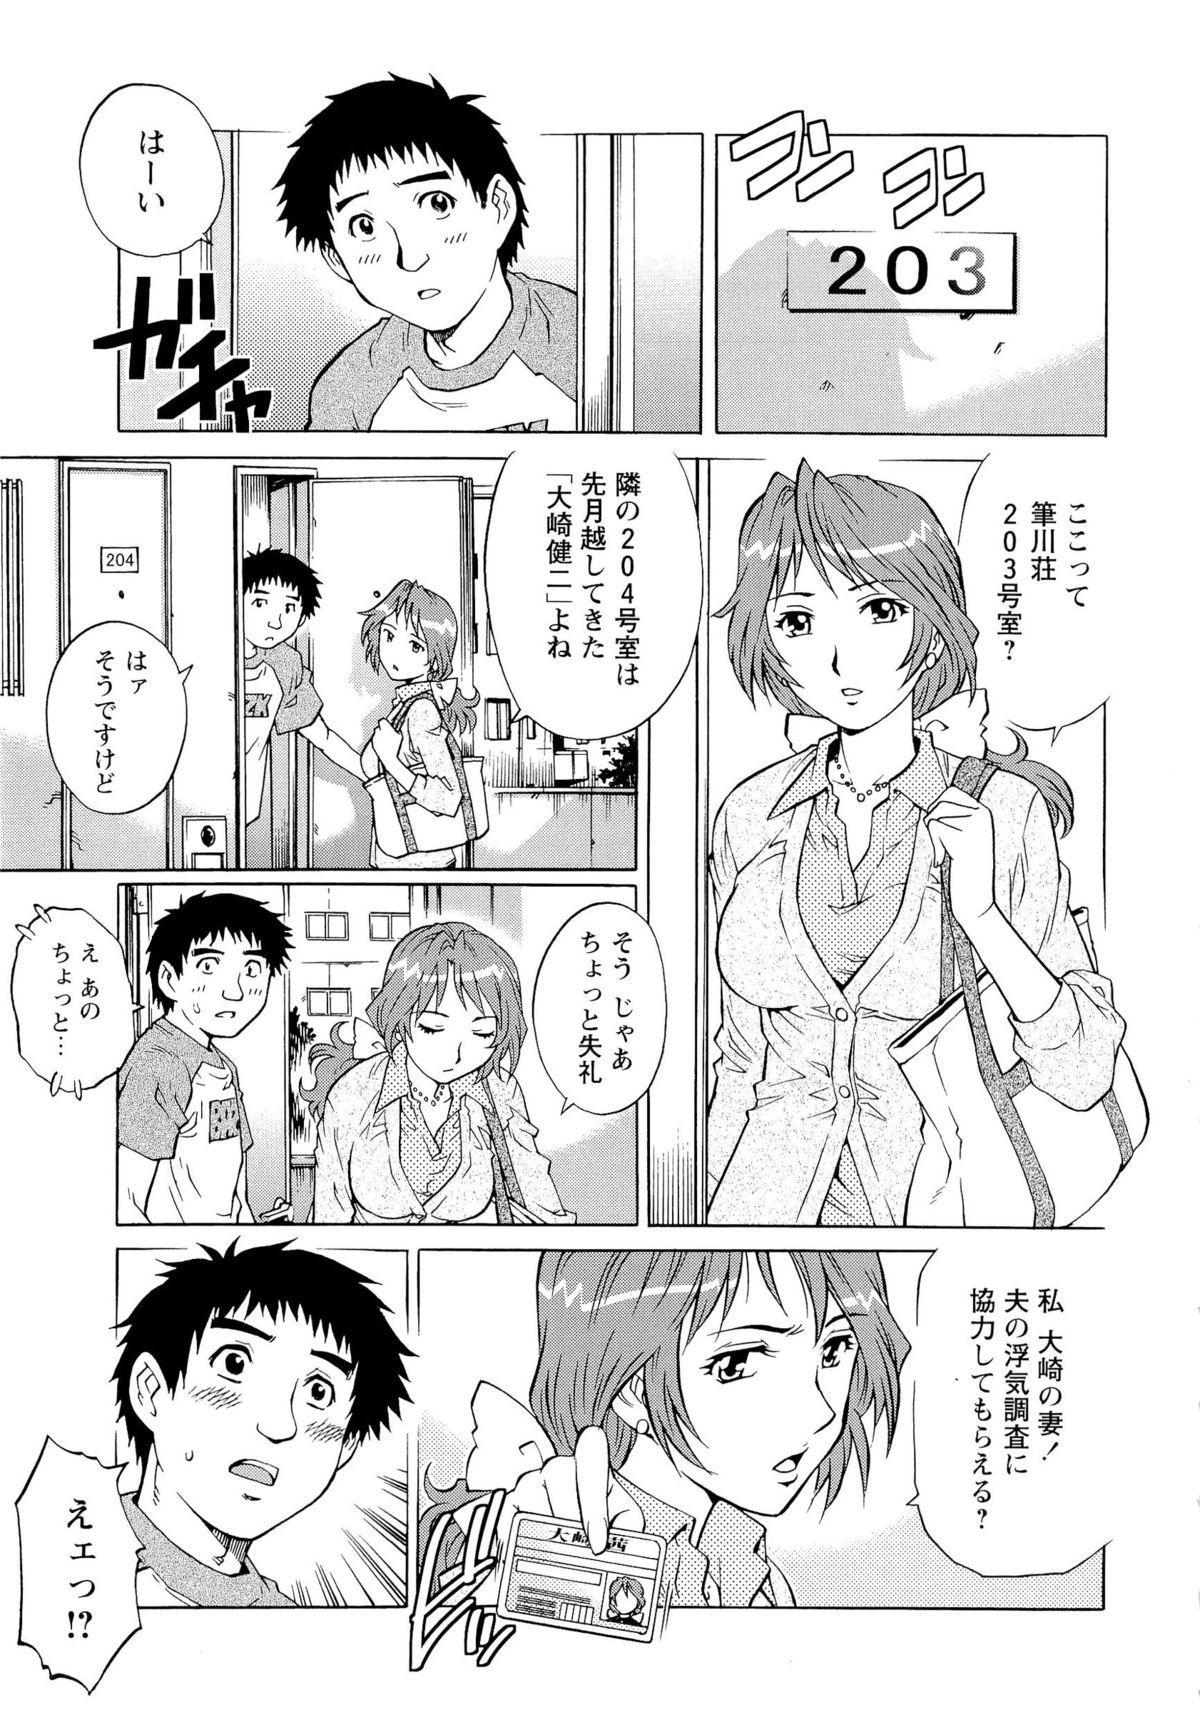 Nureteru Hitozuma - Wetly Wife 147